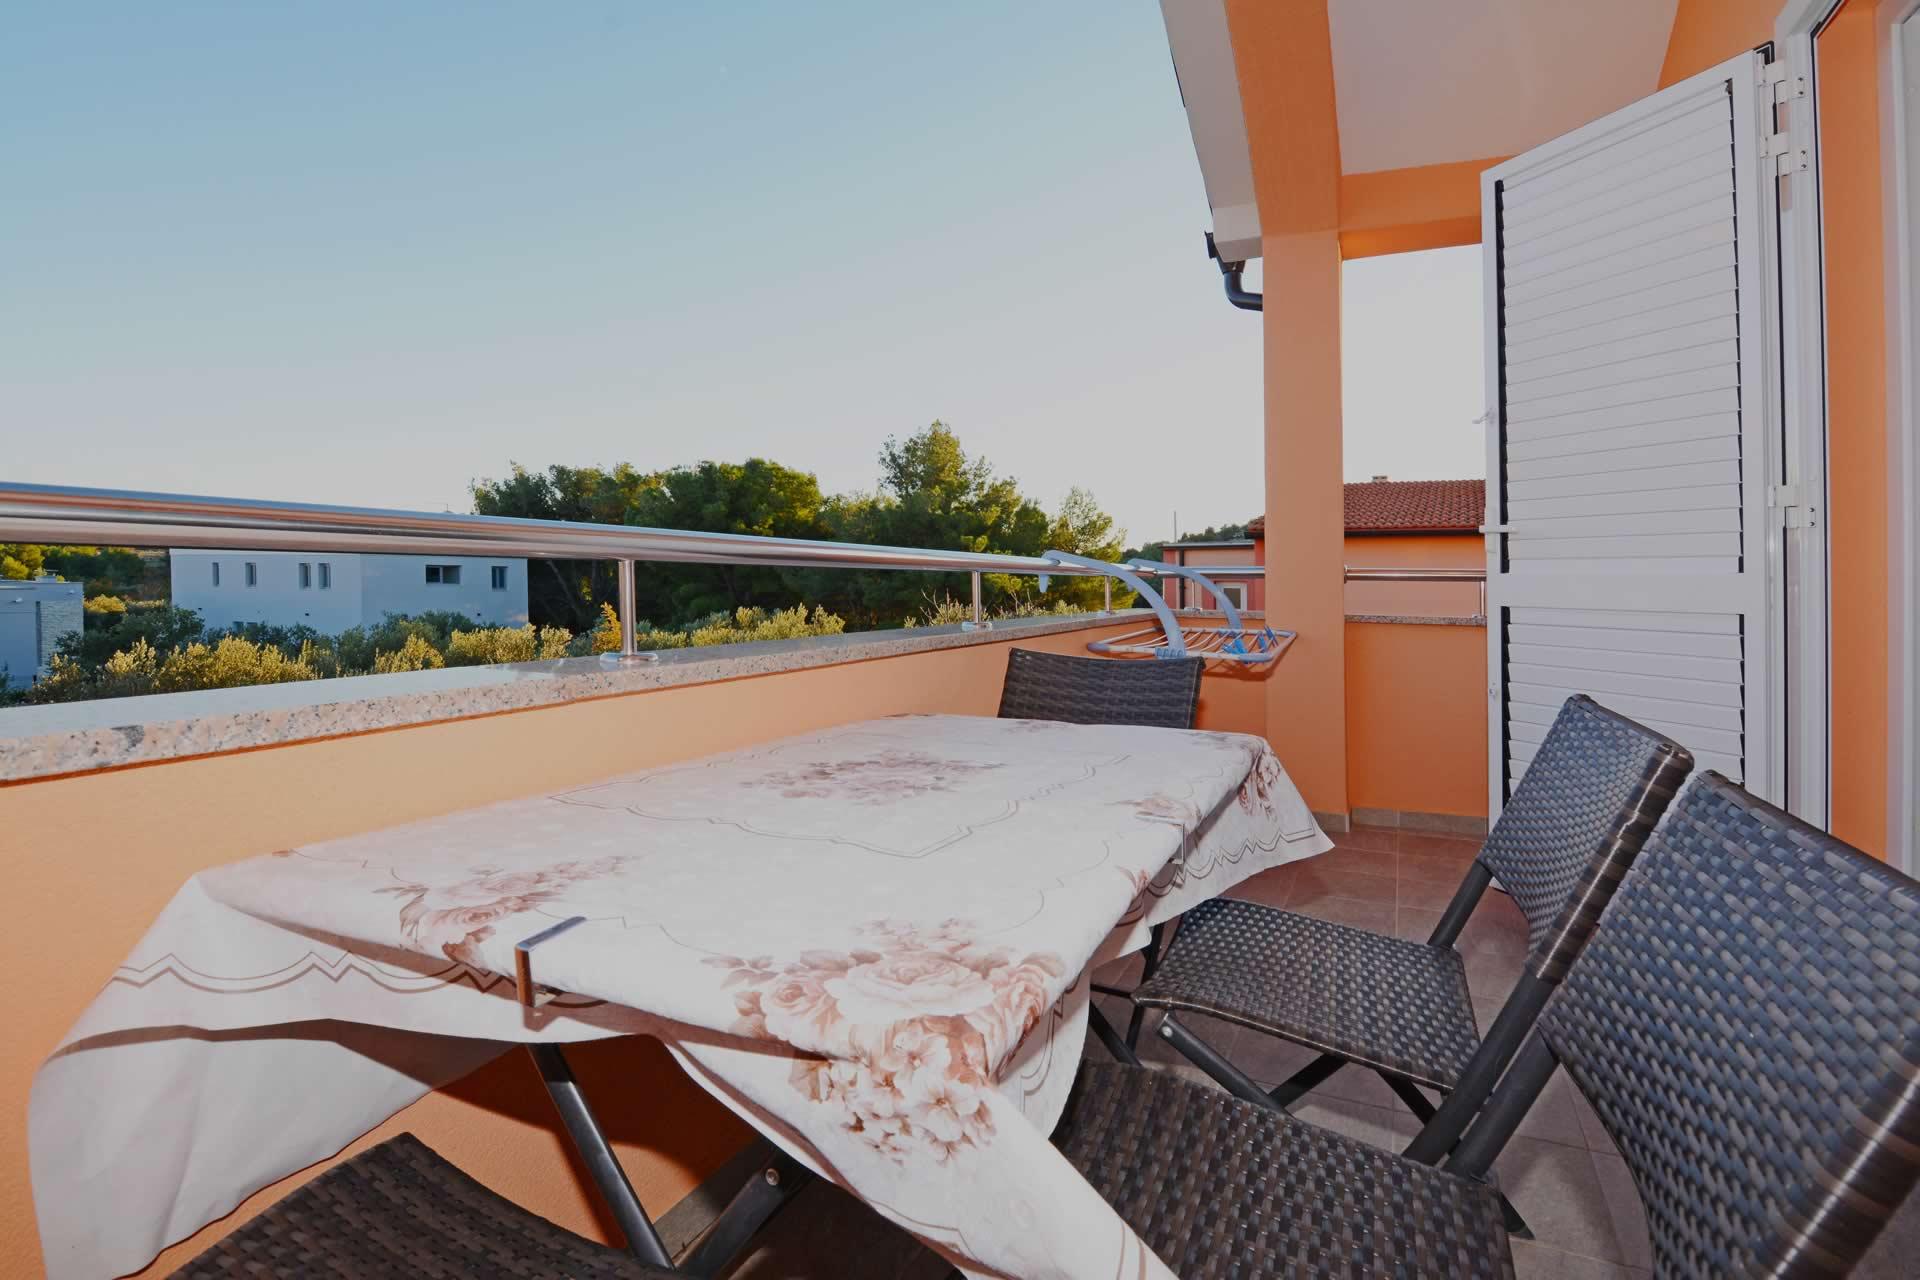 Ferienhaus mit Boot mieten in Kroatien